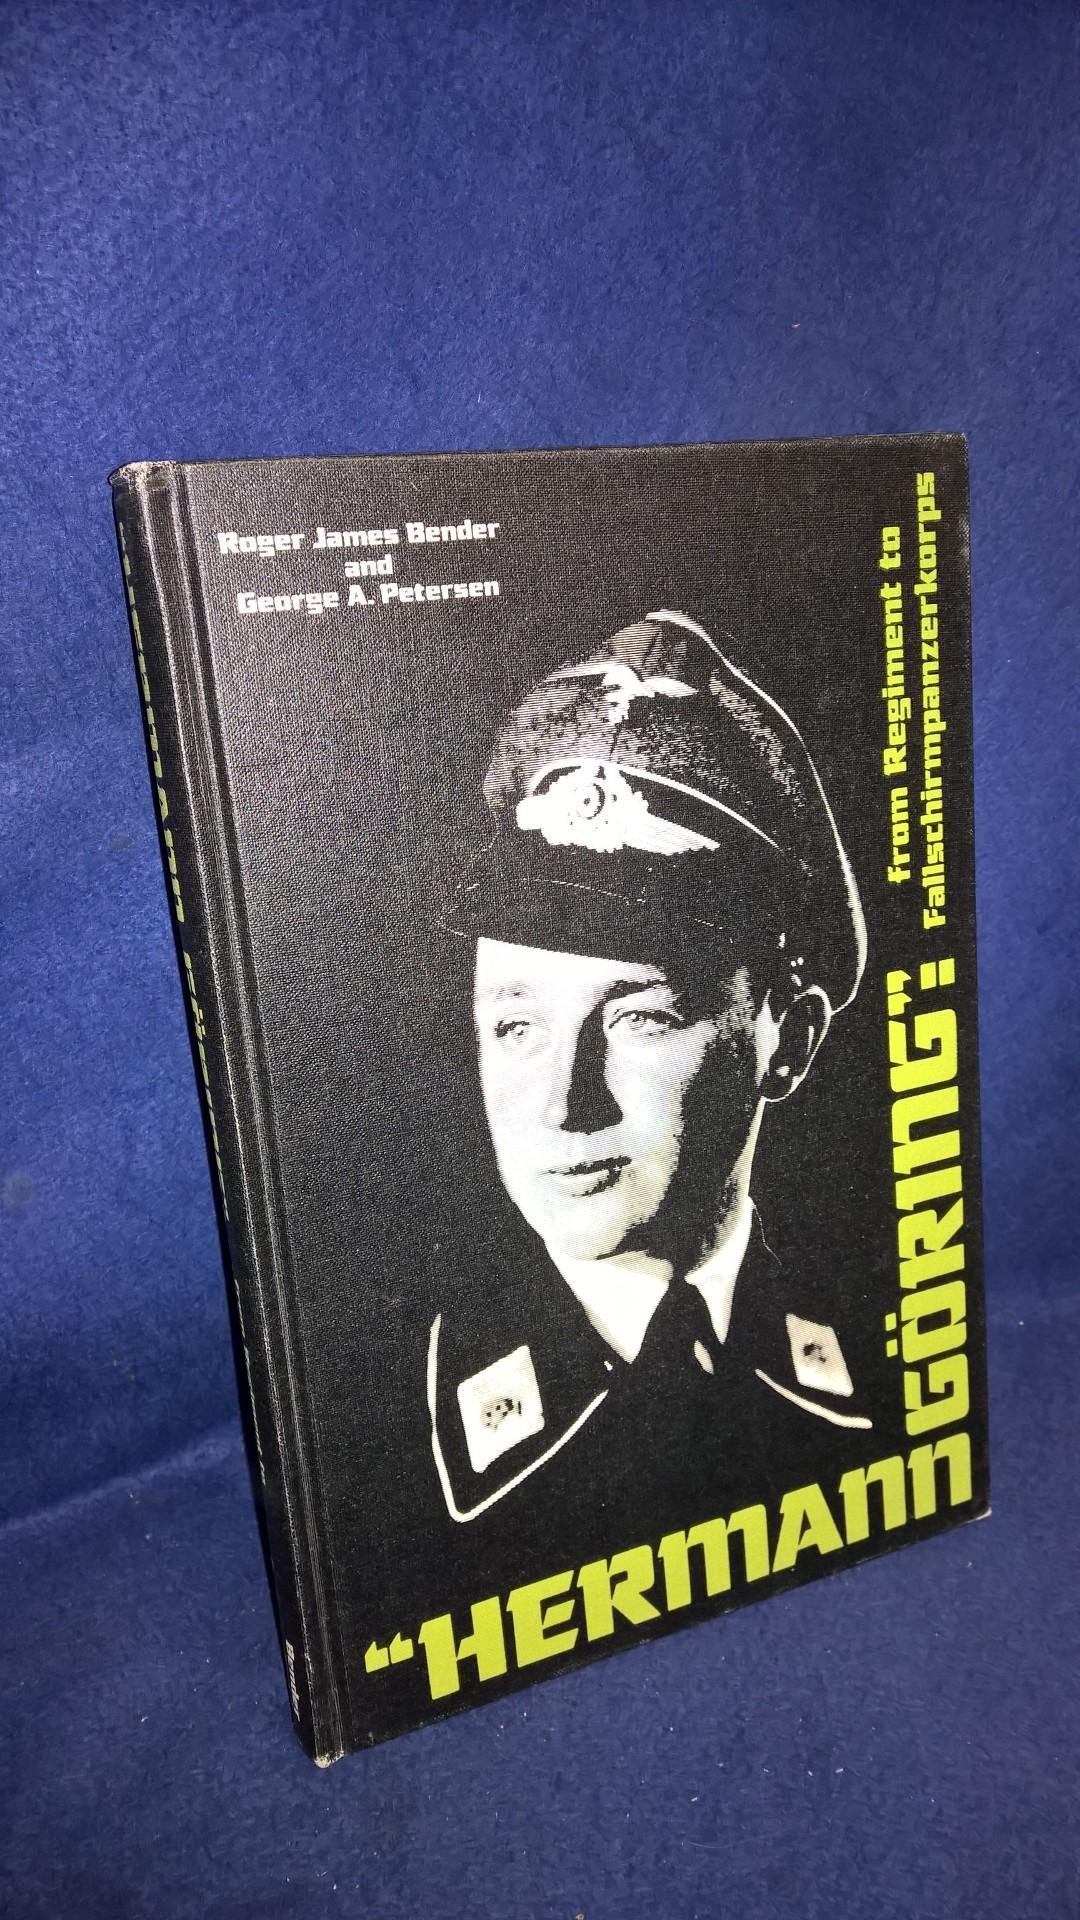 Hermann Göring, from Regiment to Fallschirmpanzerkorps.